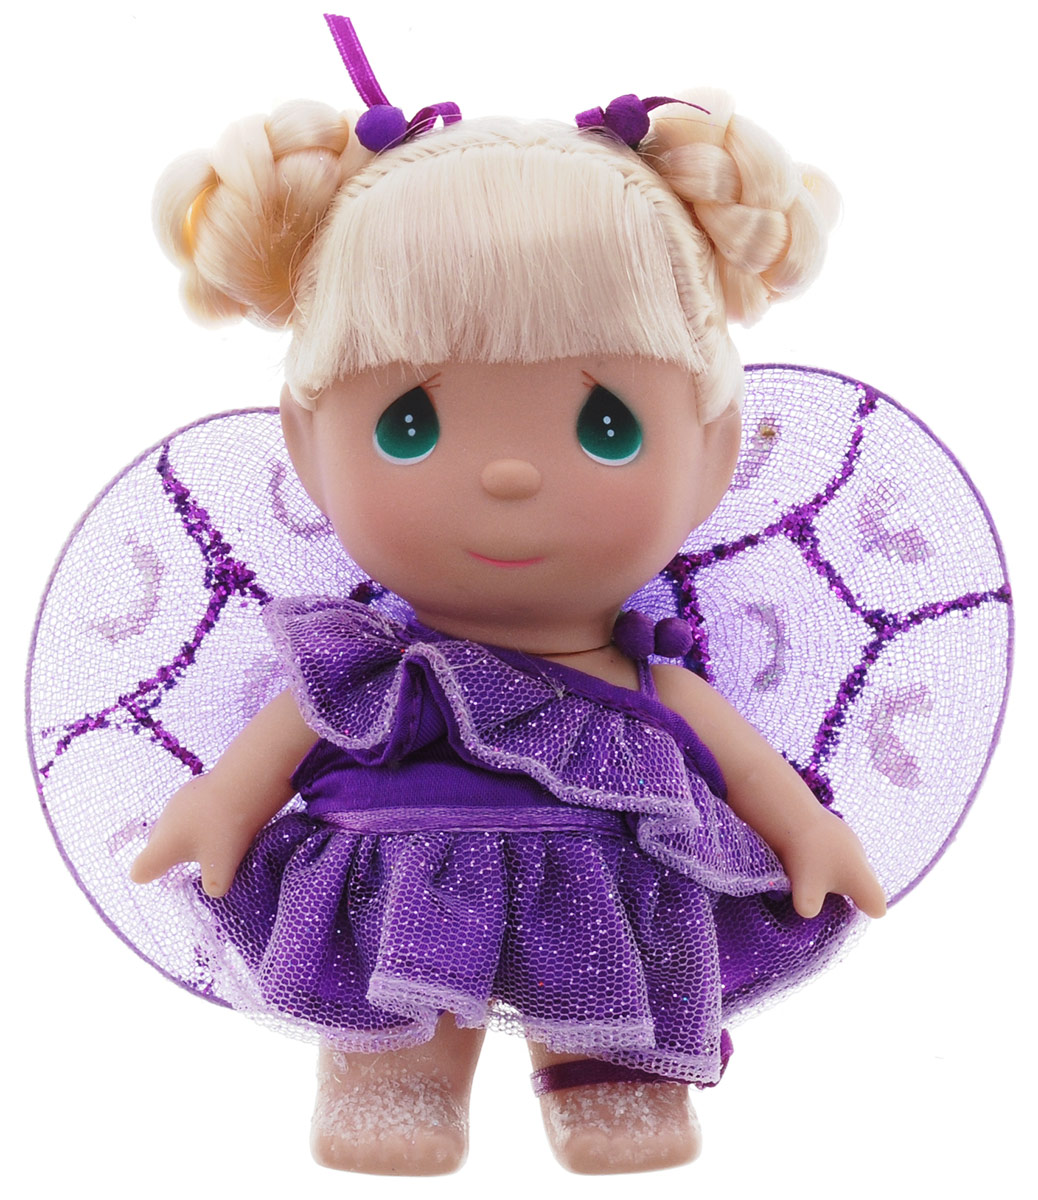 Precious Moments Мини-кукла Волшебный виноград precious moments мини кукла бабочка цвет наряда розовый сиреневый